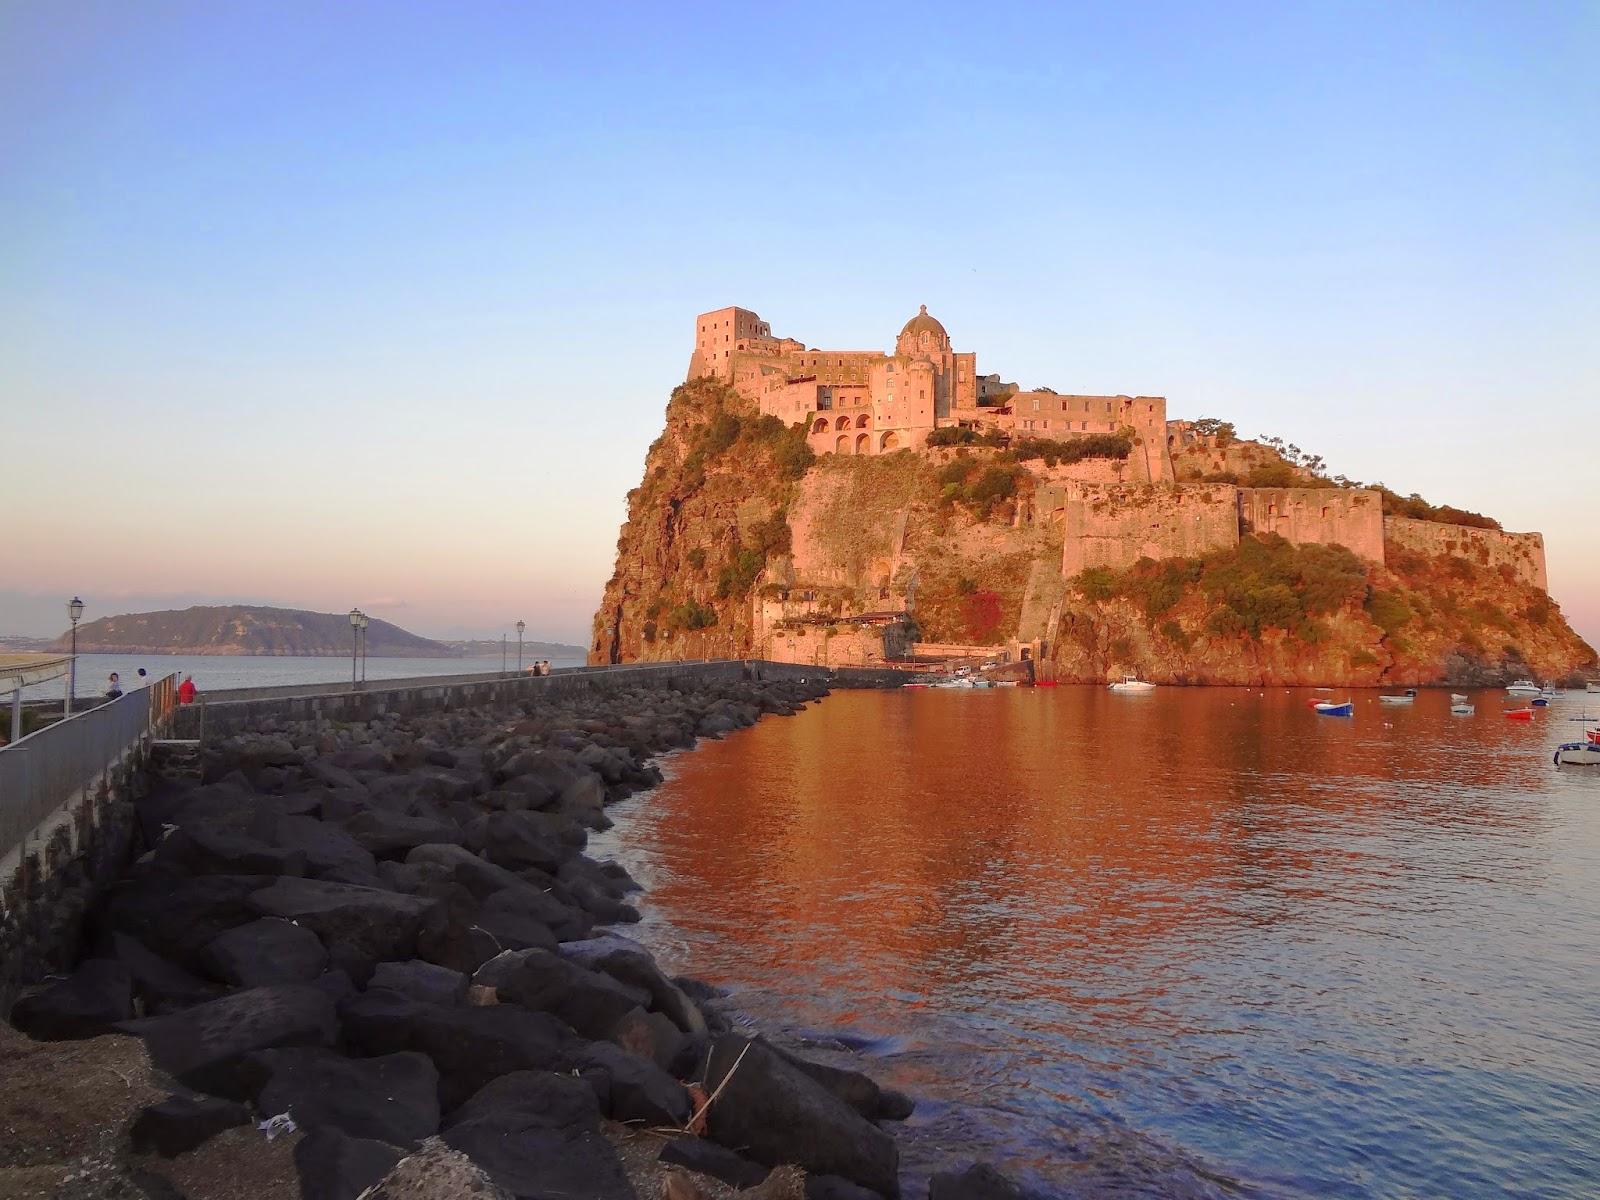 Best Italian castles